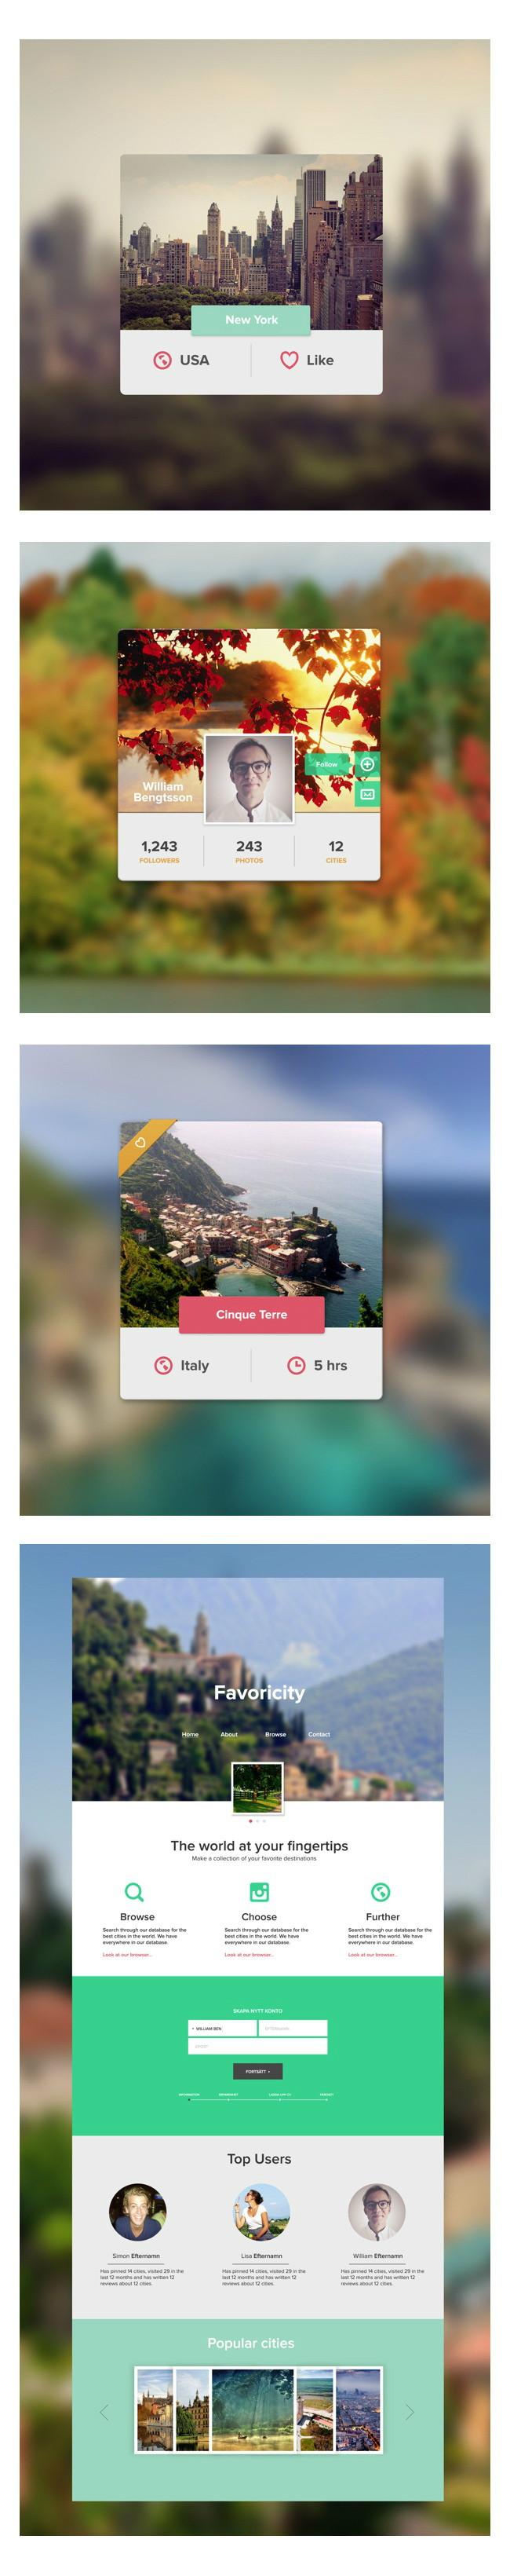 Favoricity website concept